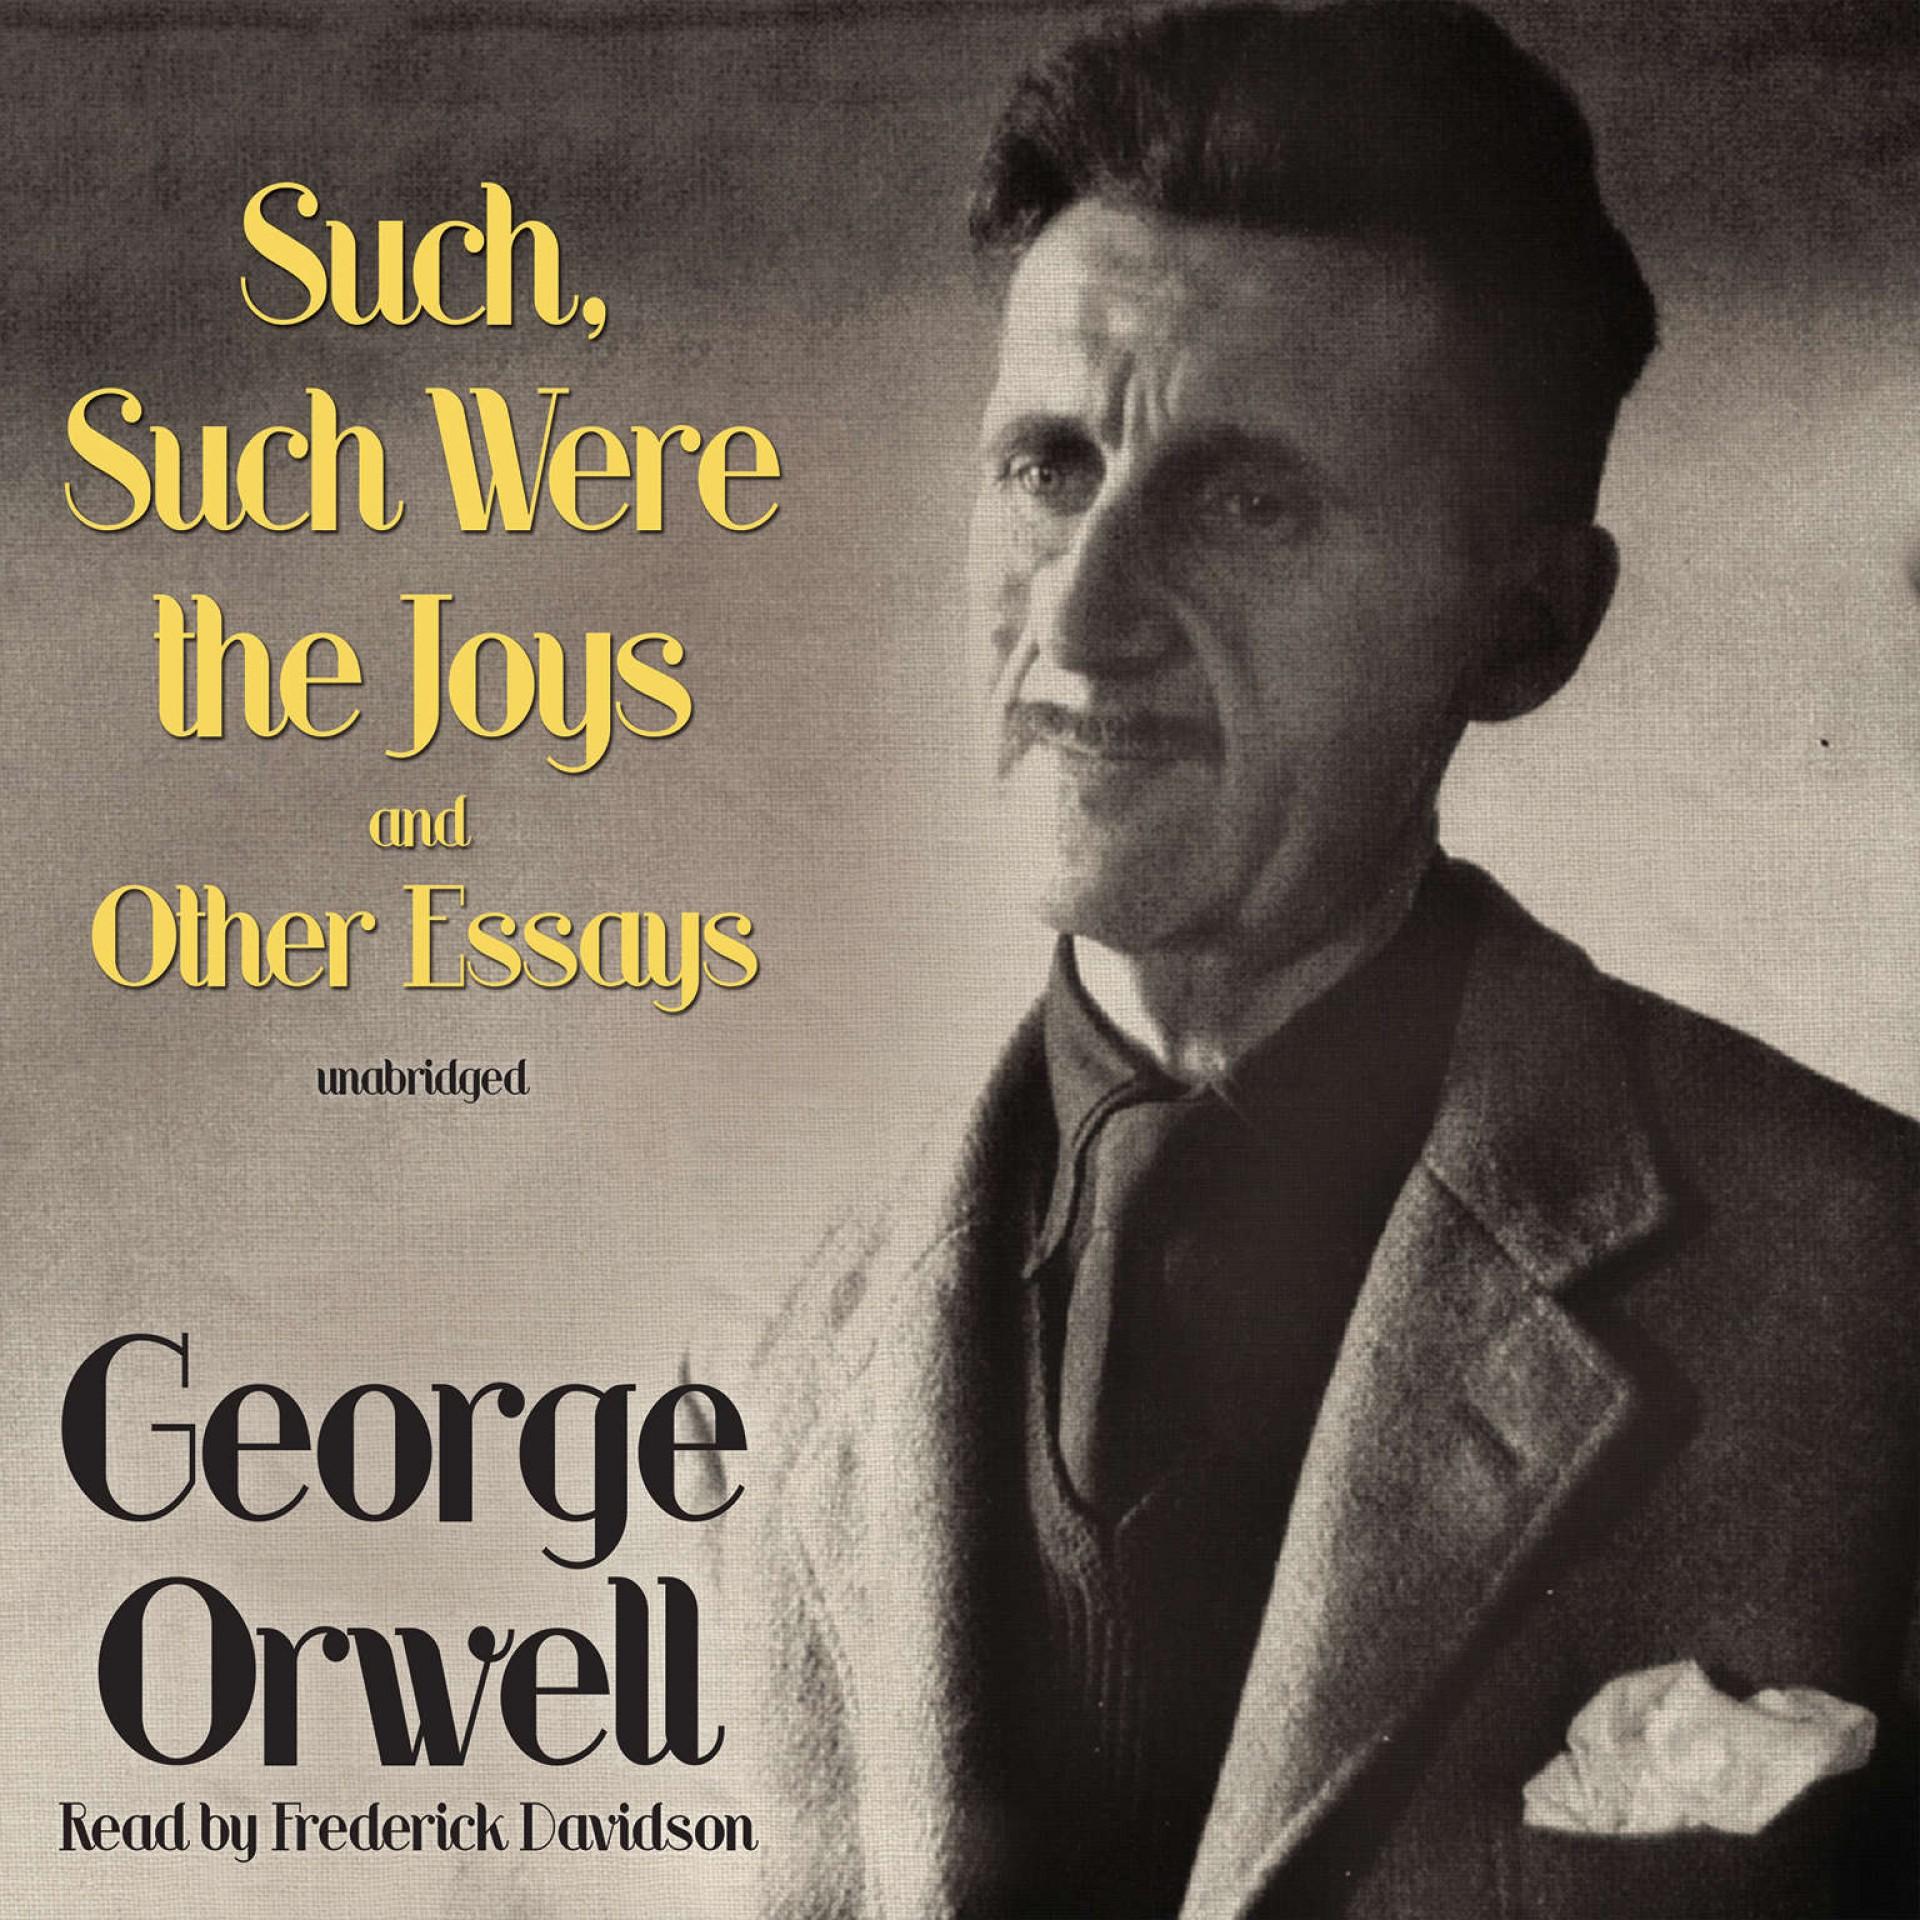 008 Square Essay Example George Orwell Frightening Essays Everyman's Library Summary Bookshop Memories 1920